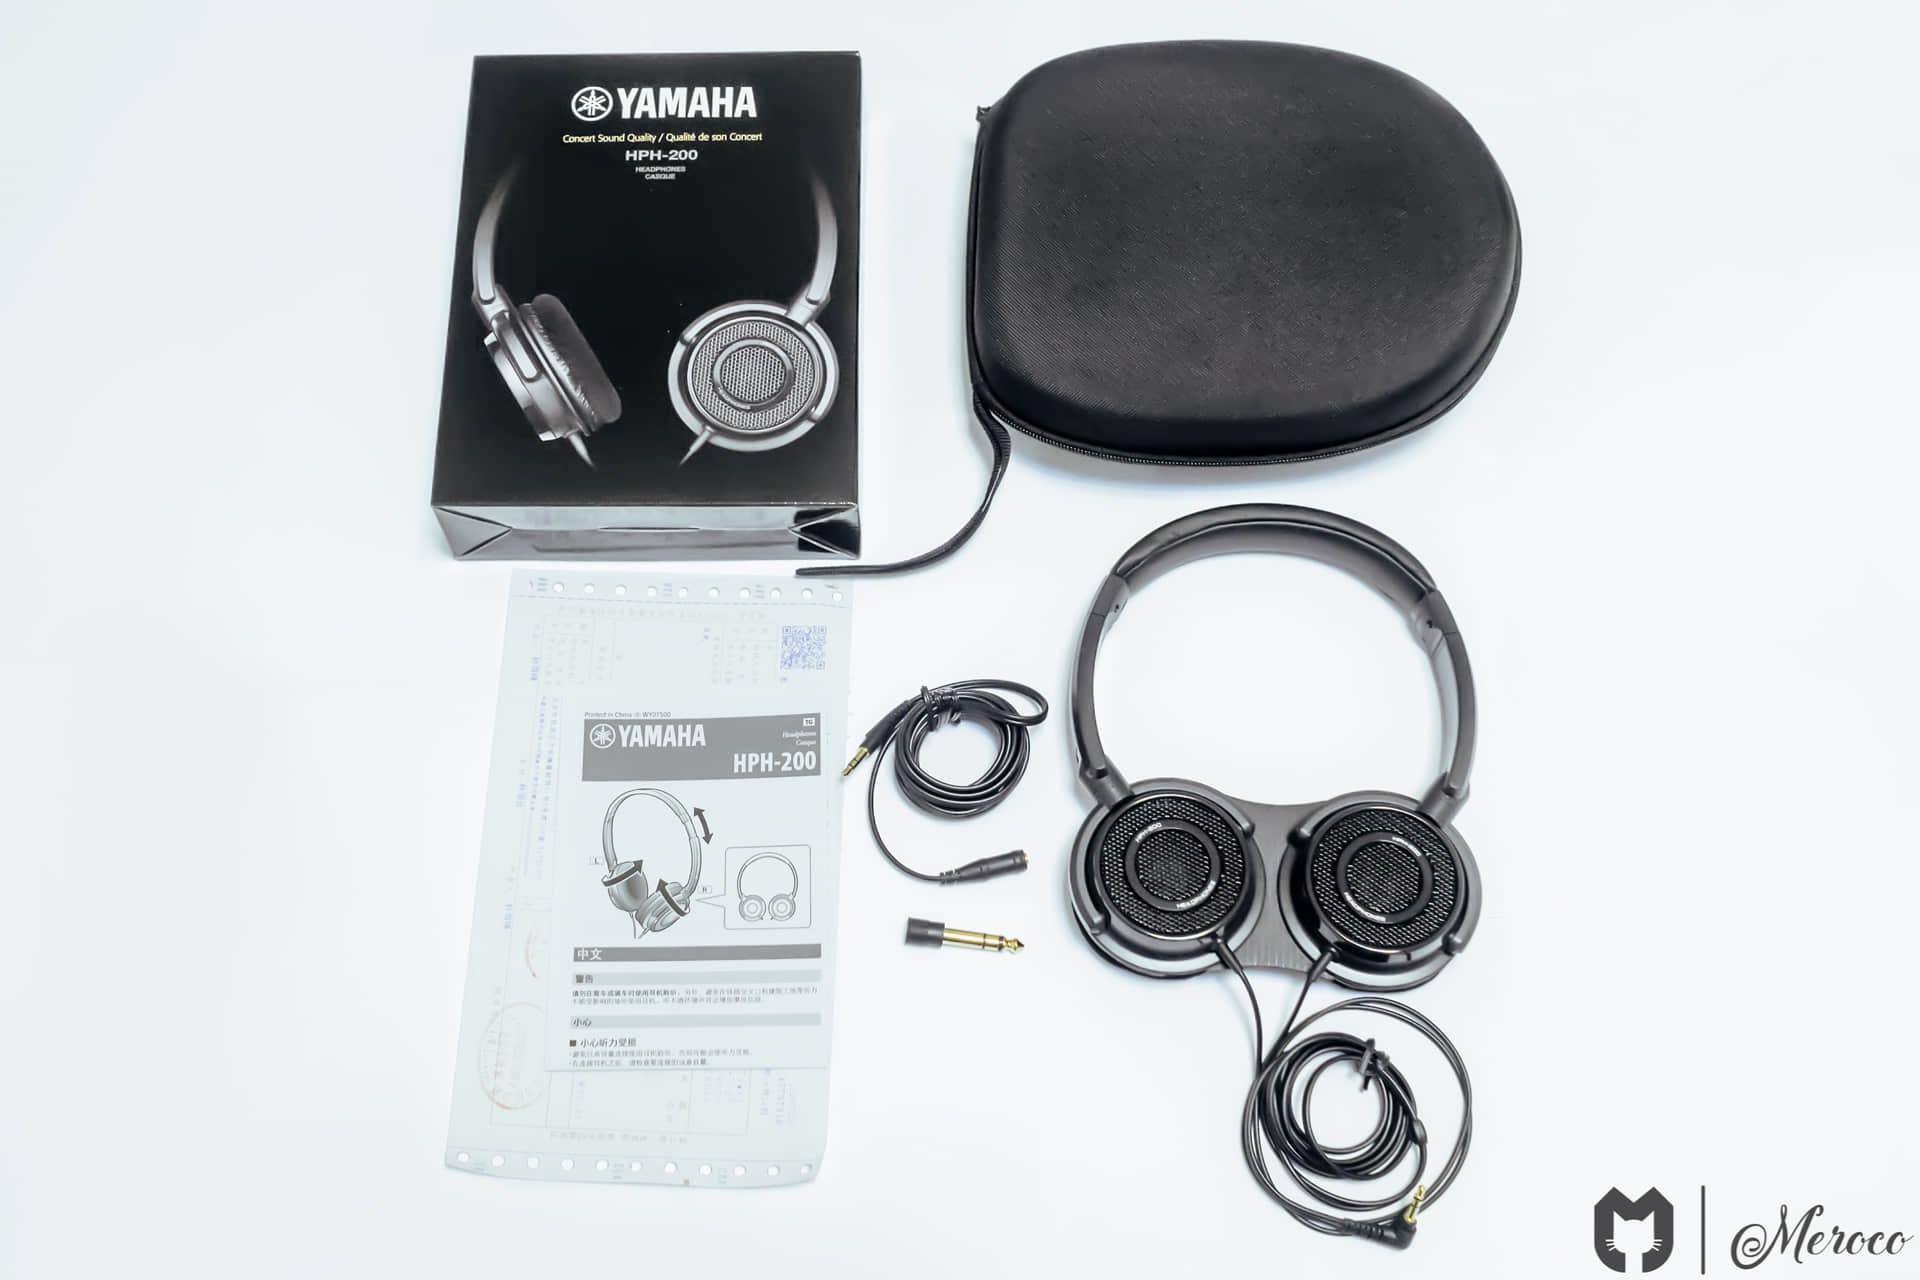 YAMAHA_HPH-200_Items.jpg